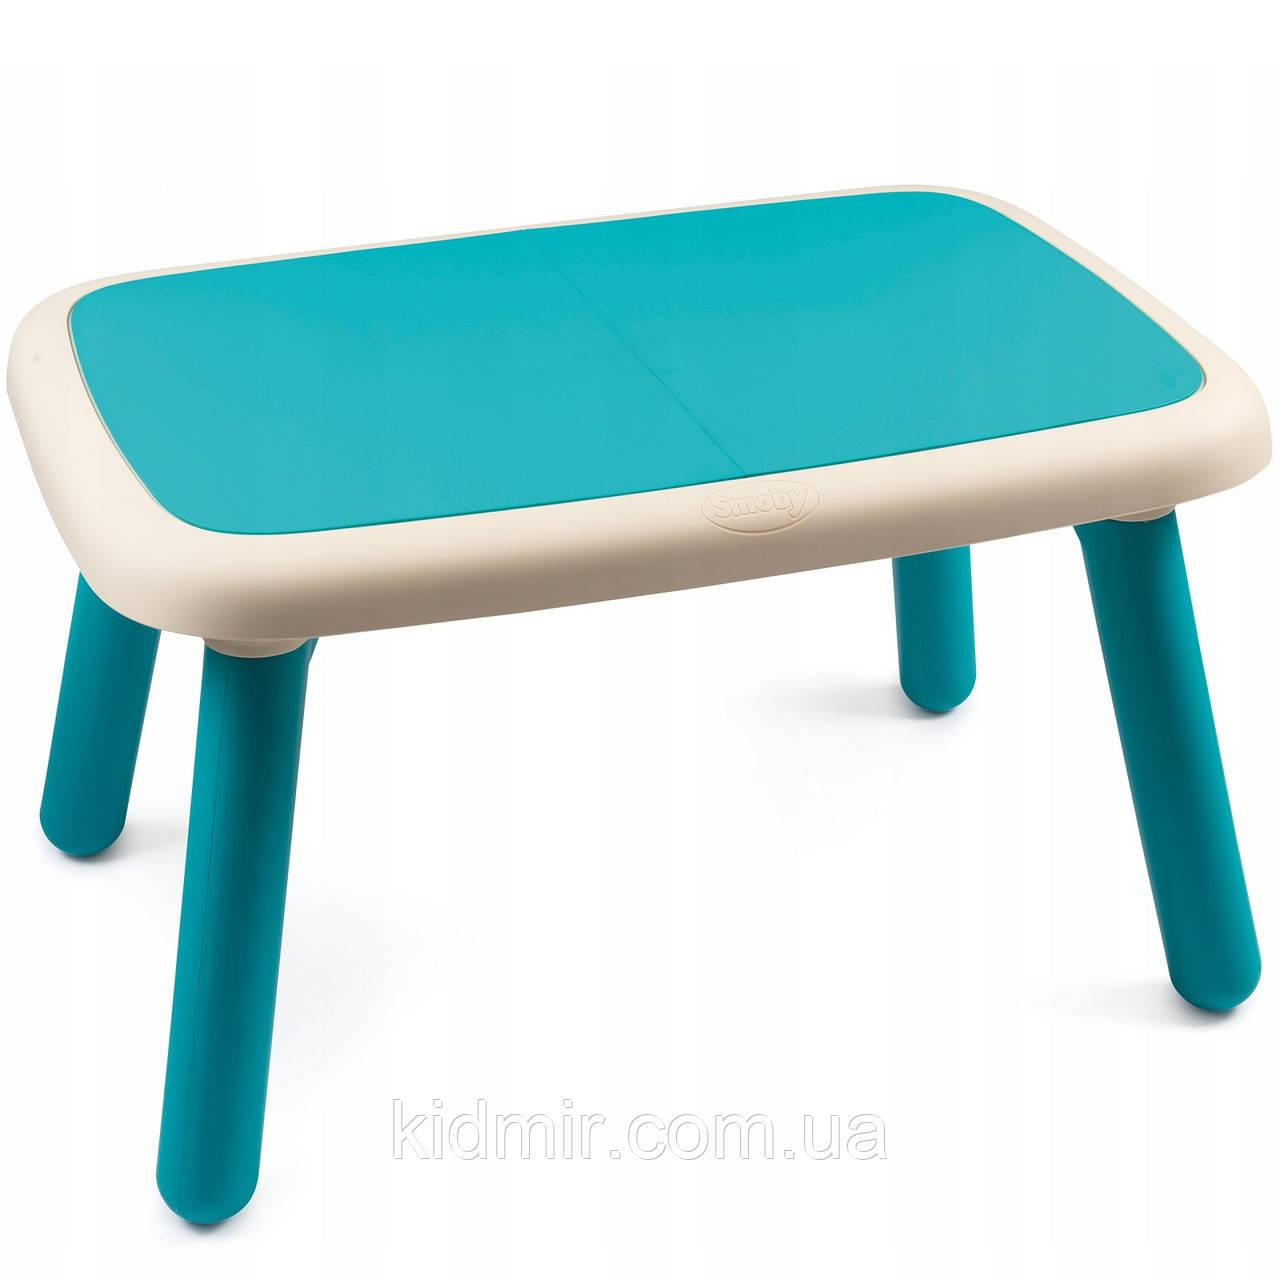 Столик детский голубой SMOBY 880402